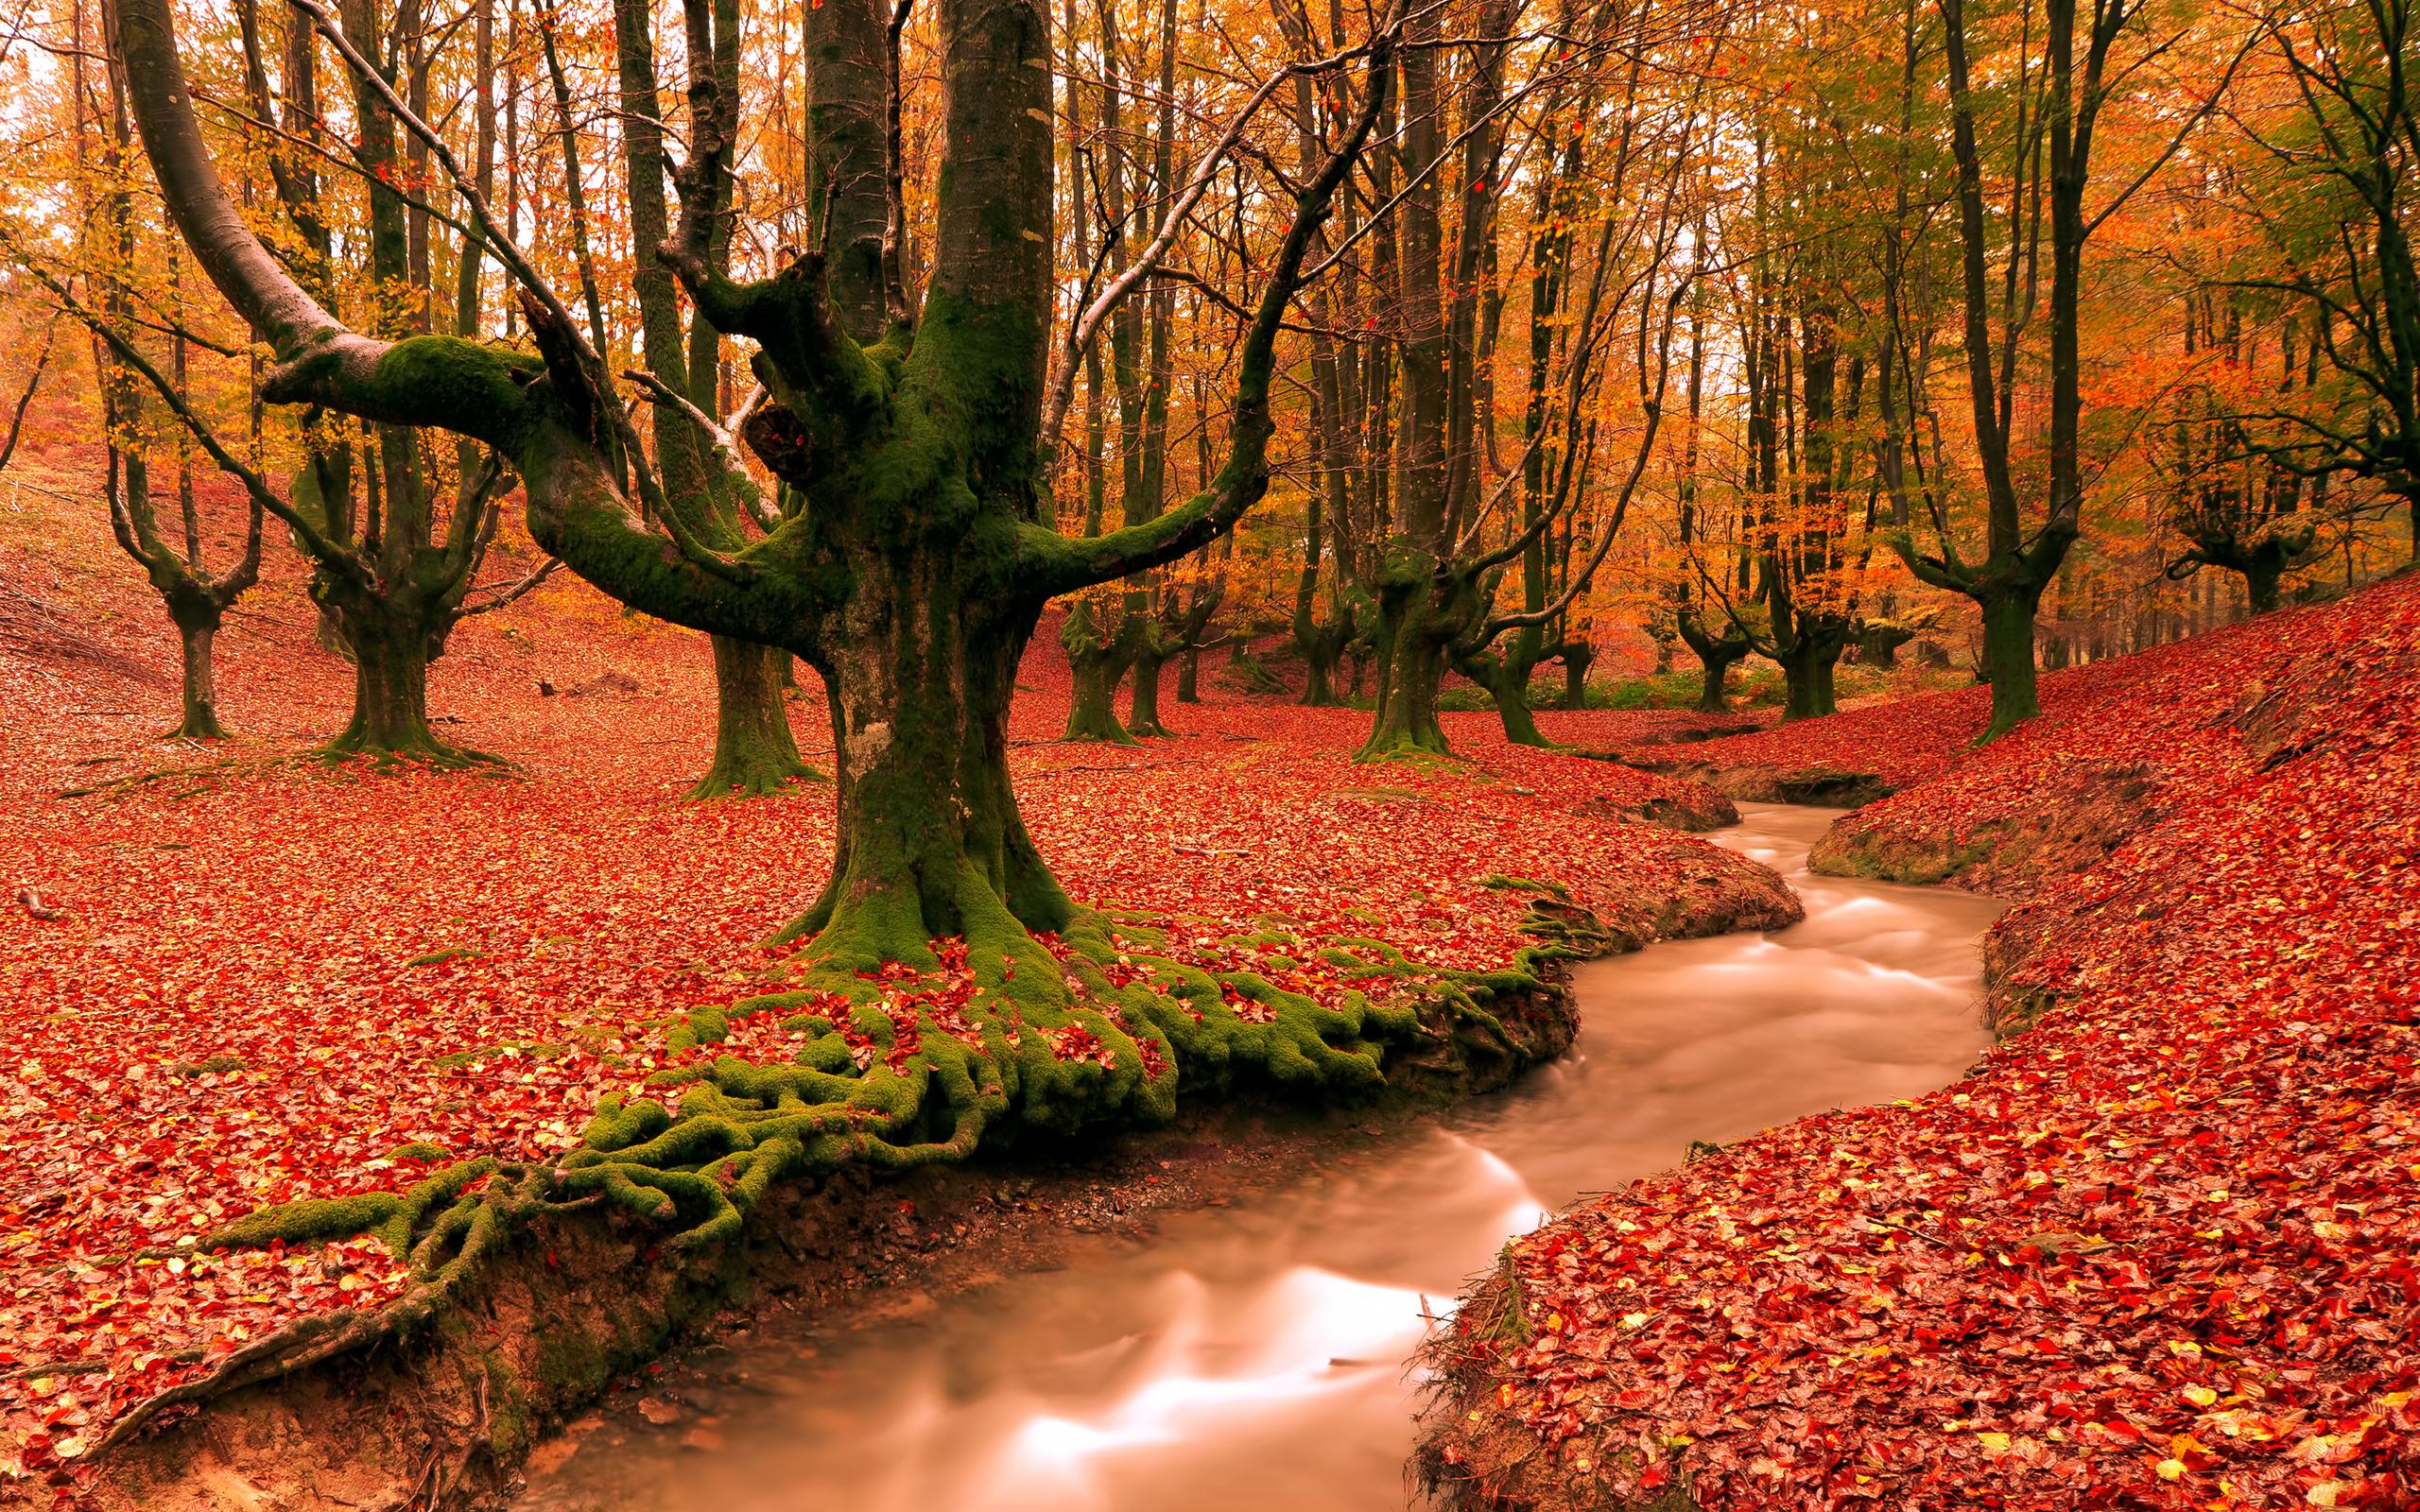 images of autumn desktop wallpapers free on latoro wallpaperhtml 2560x1600